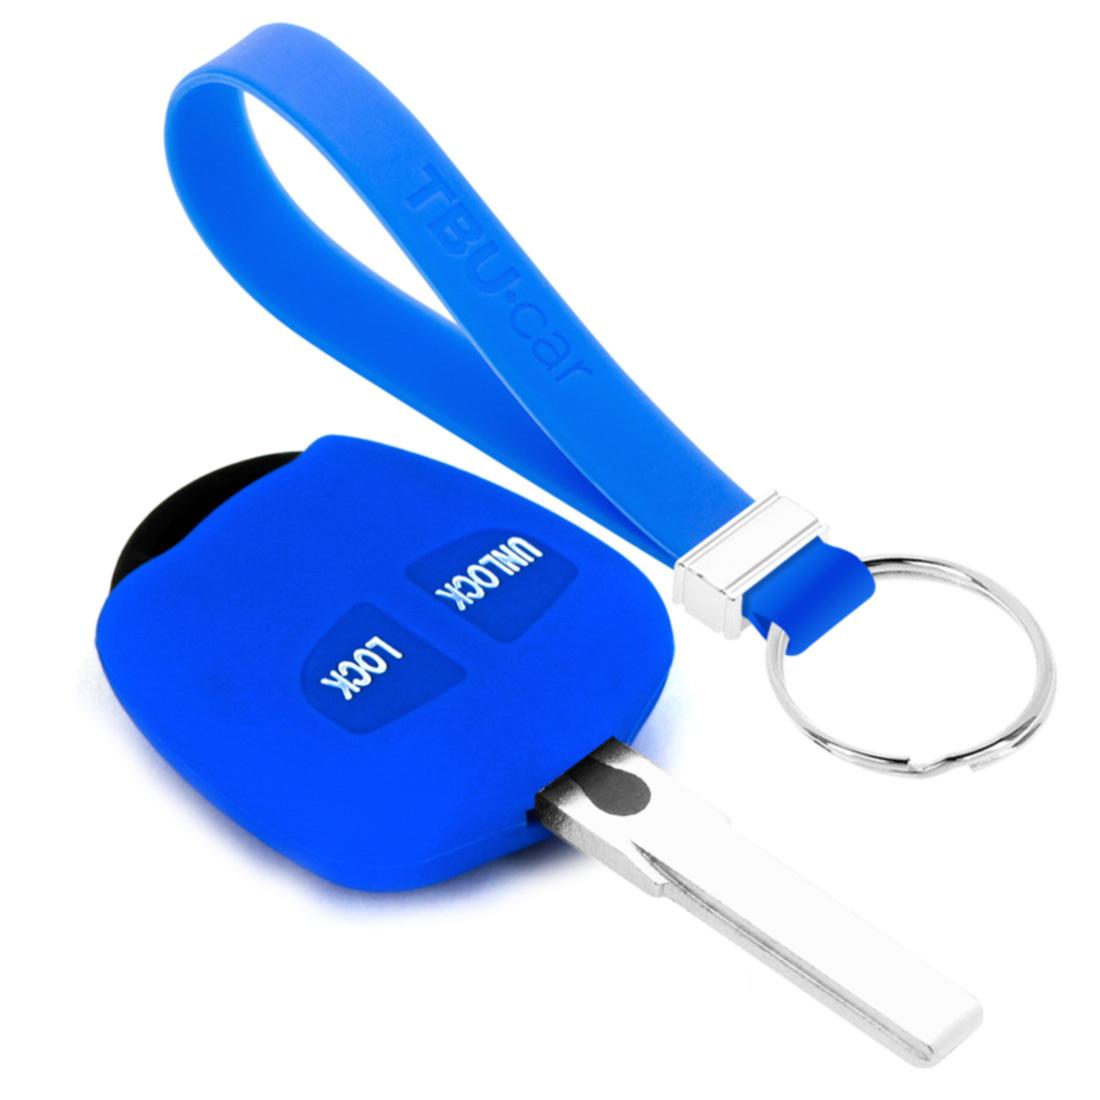 TBU car TBU car Sleutel cover compatibel met Mitsubishi - Silicone sleutelhoesje - beschermhoesje autosleutel - Blauw